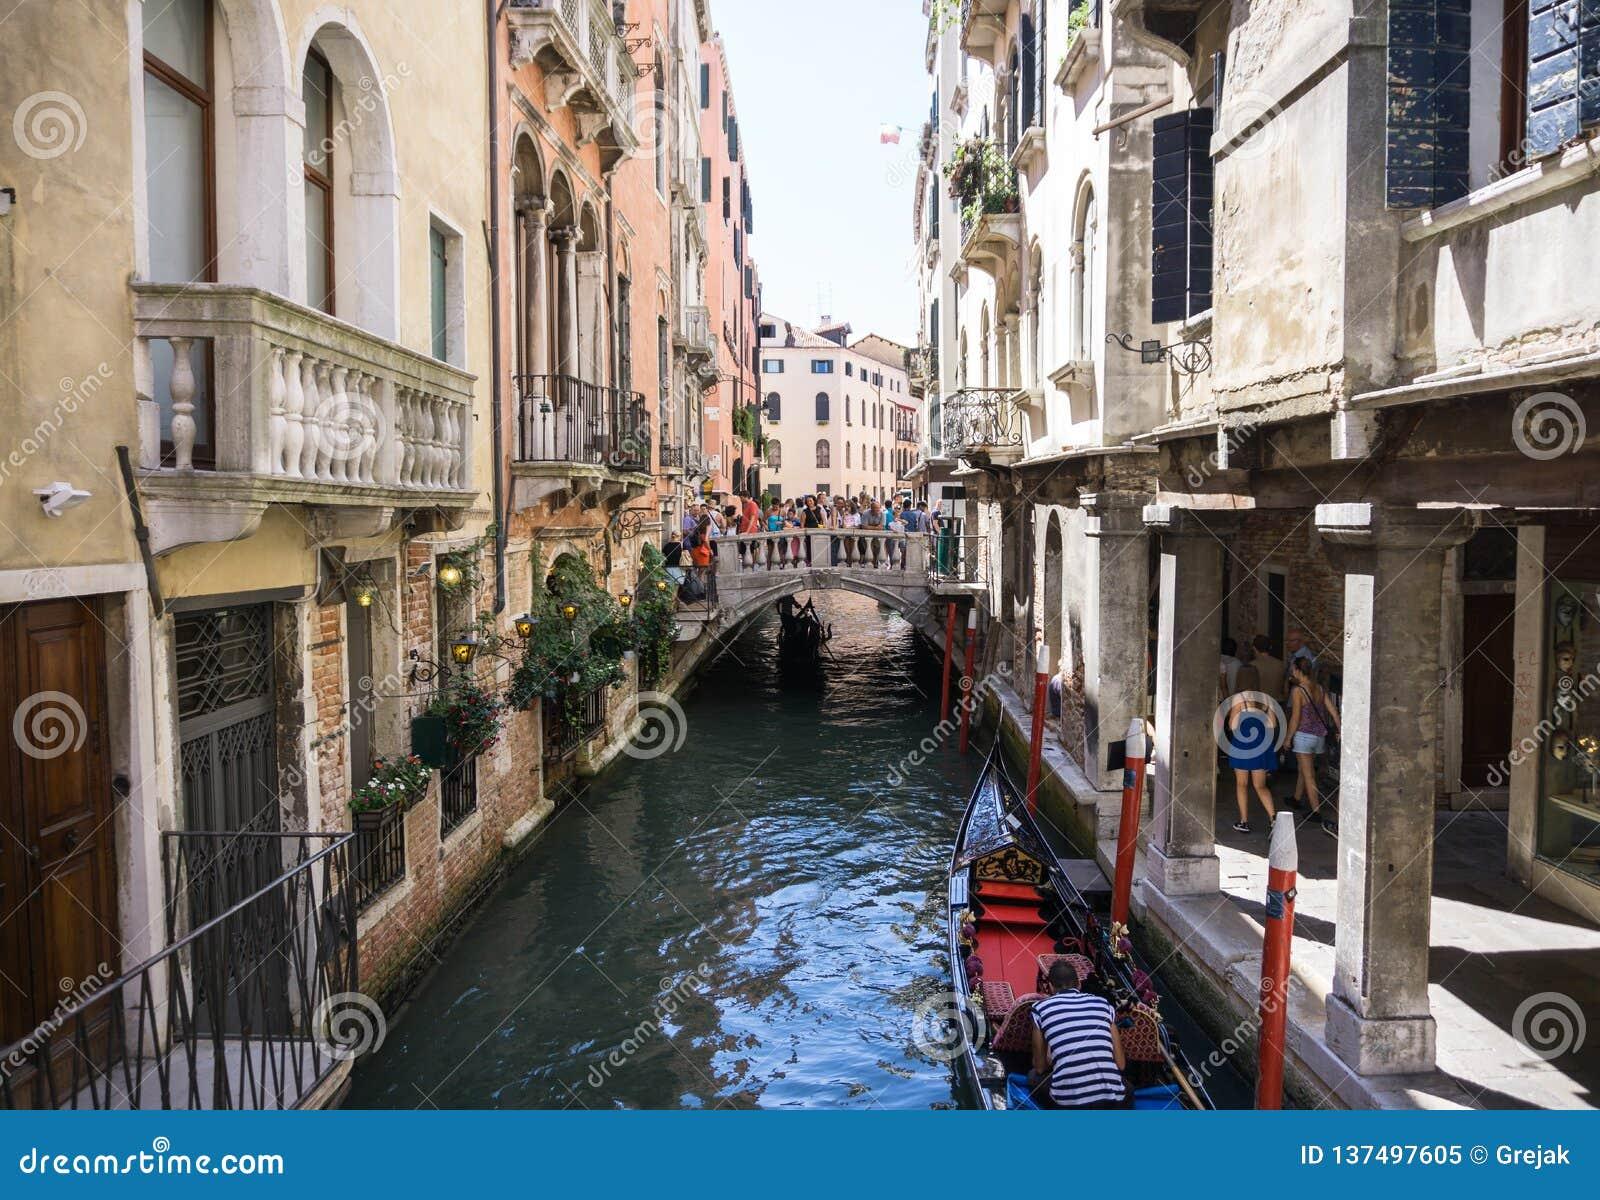 Mening van Rio Marin Canal met boten en gondels van Ponte DE La Bergami in Venetië, Italië Venetië is populair